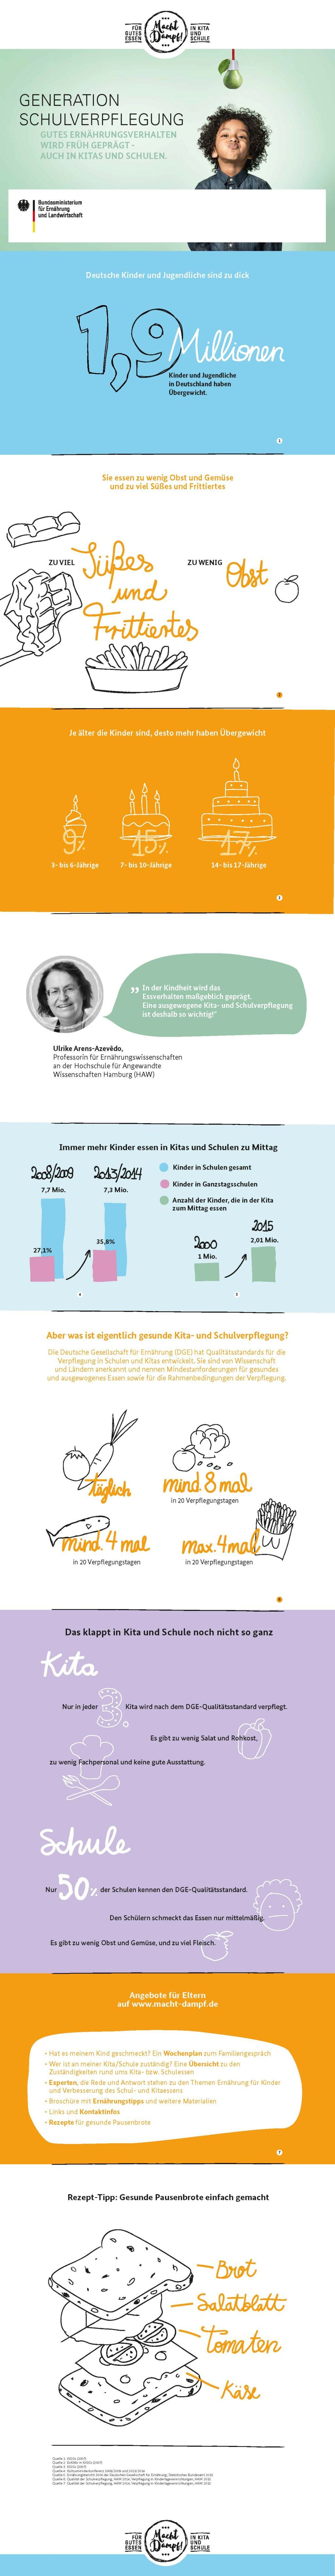 Macht Dampf_Adipositastag_Faktenblatt